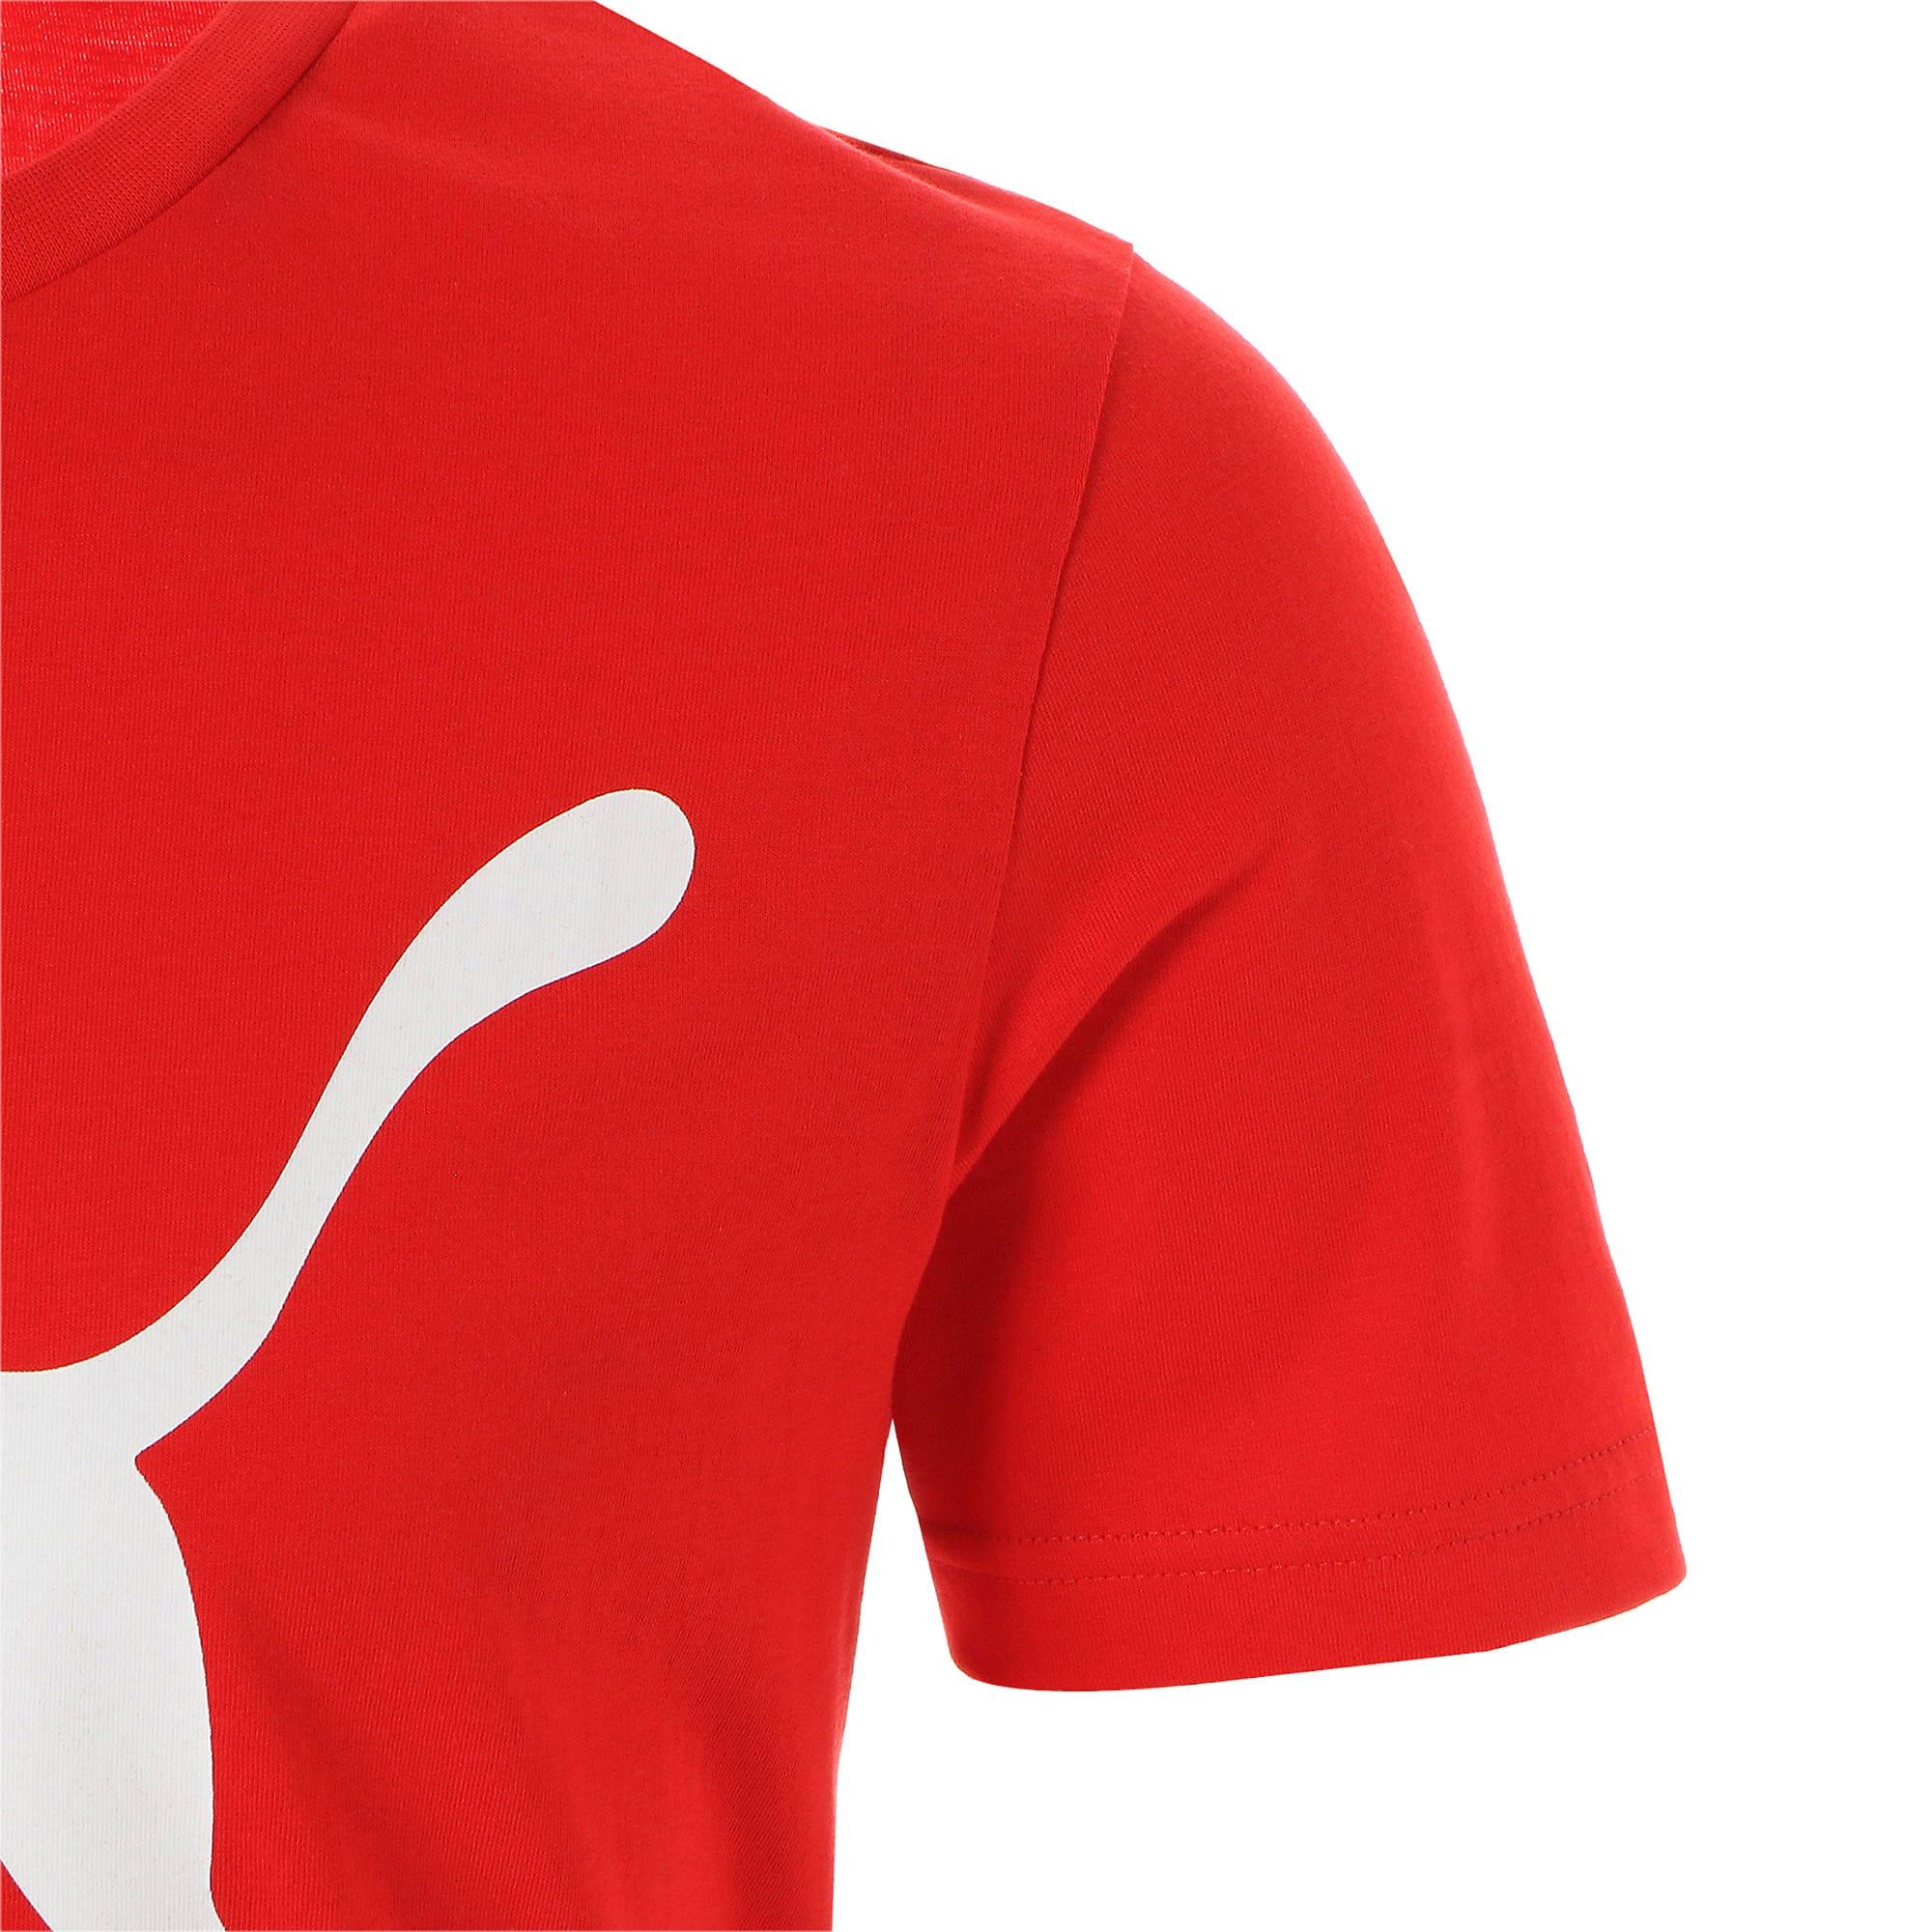 Thumbnail 8 of CLASSICS ロゴ SS Tシャツ 半袖, High Risk Red, medium-JPN